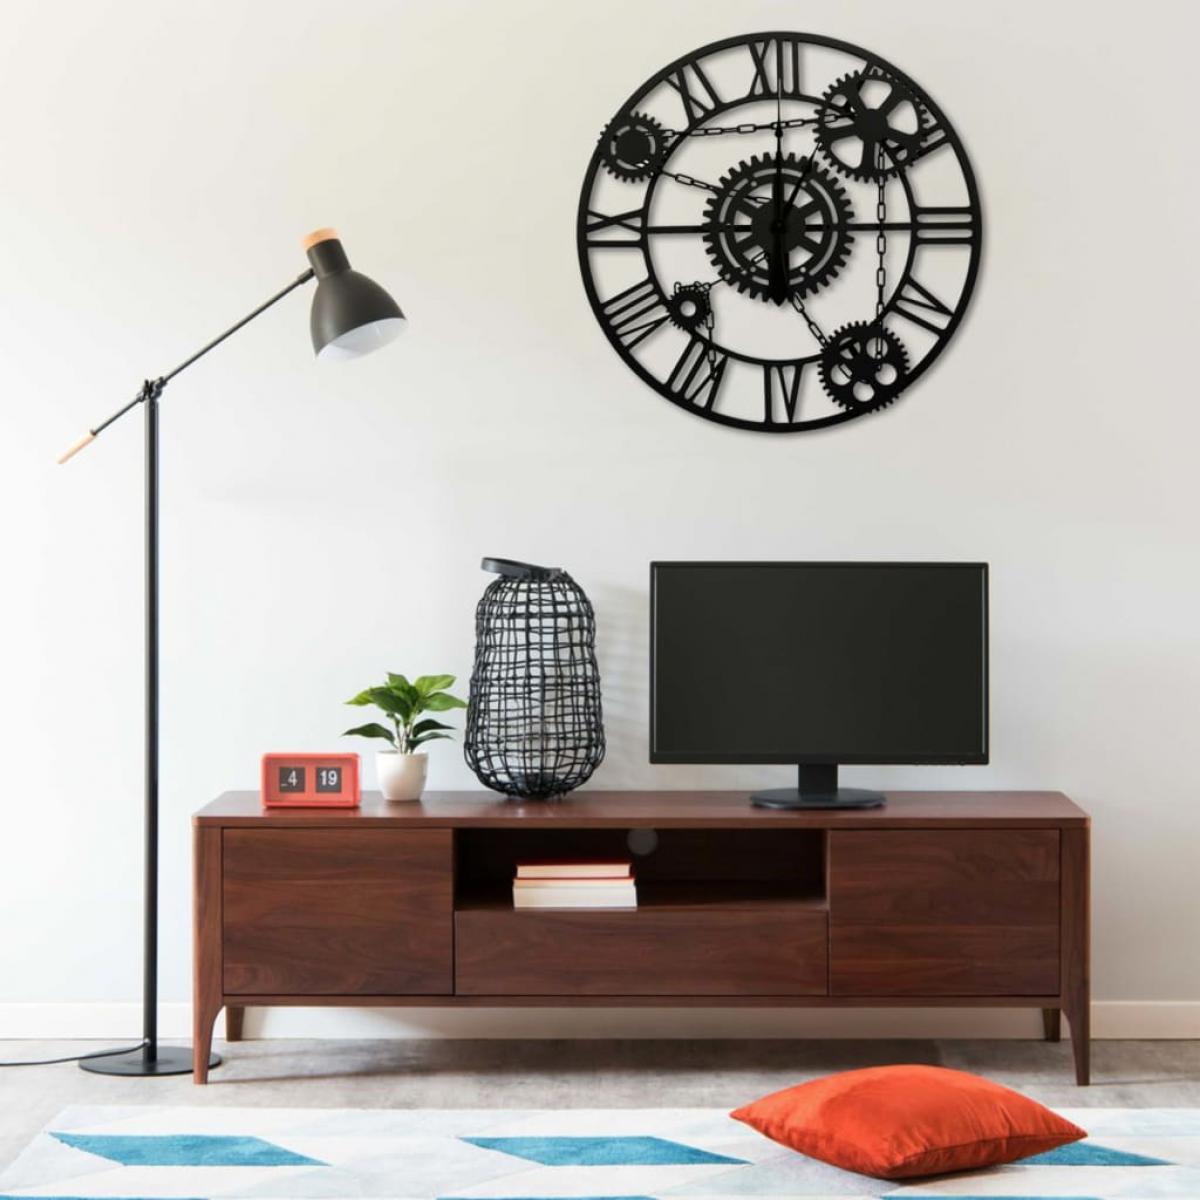 Vidaxl vidaXL Horloge murale Marron 80 cm Métal